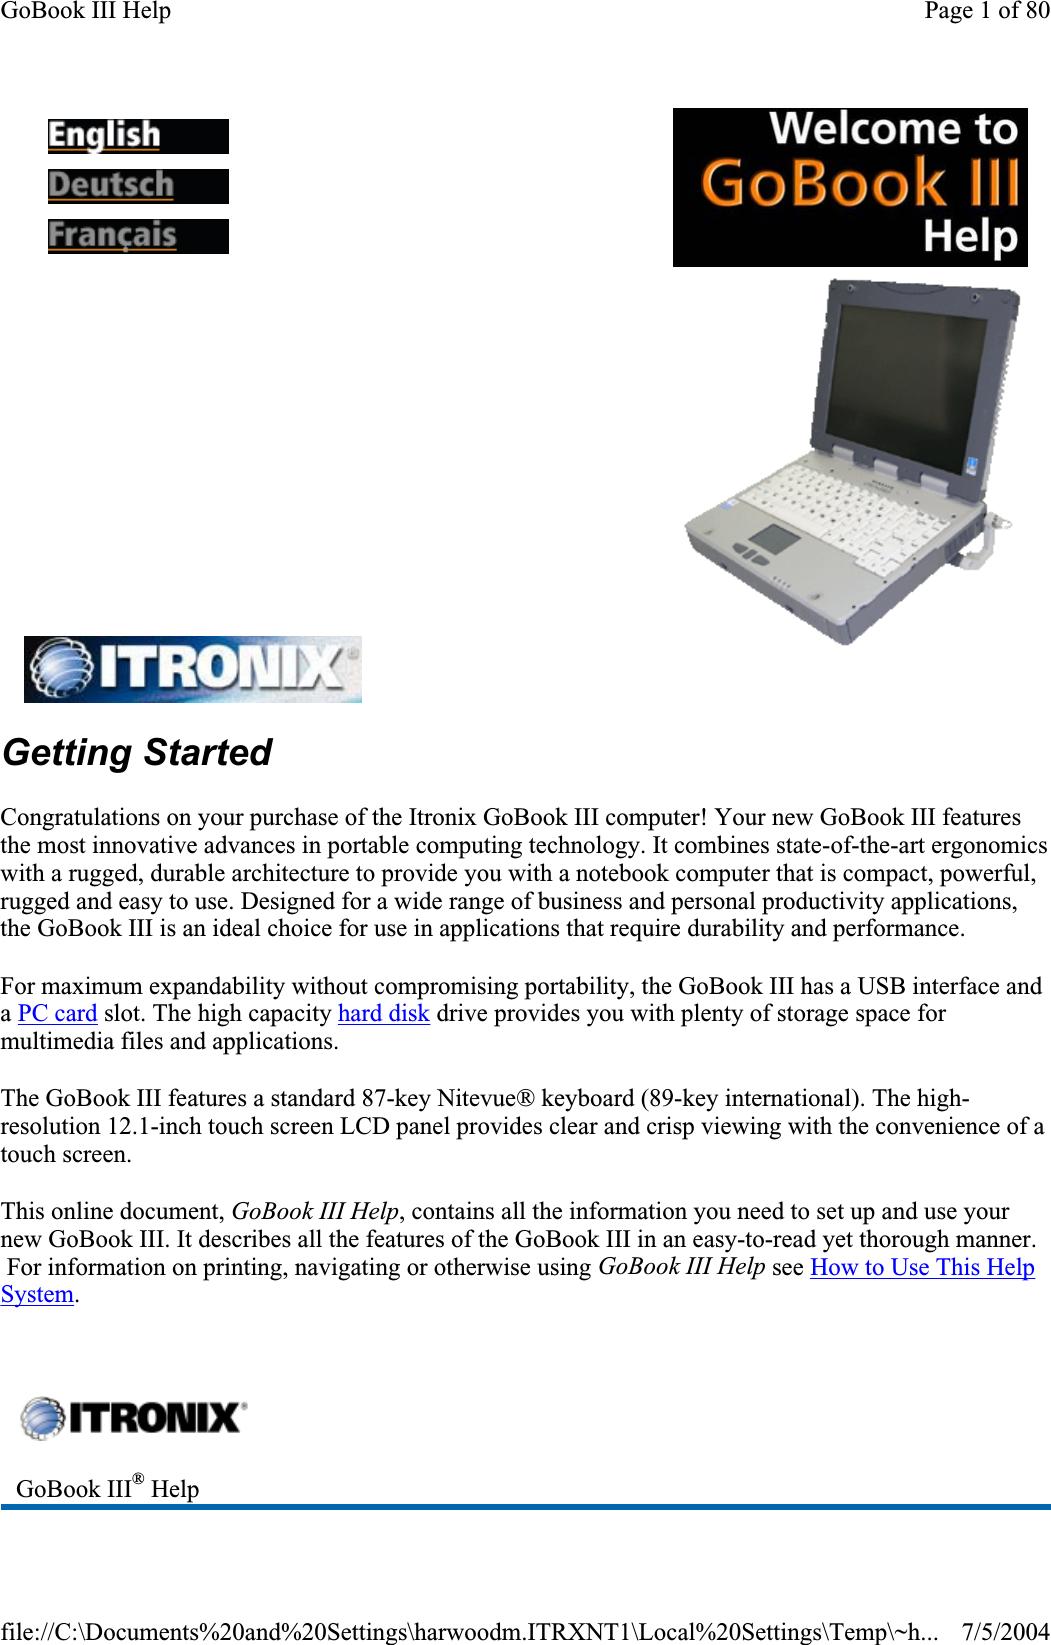 General Dynamics Itronix IX260PNL3AC580 Laptop PC with Dual